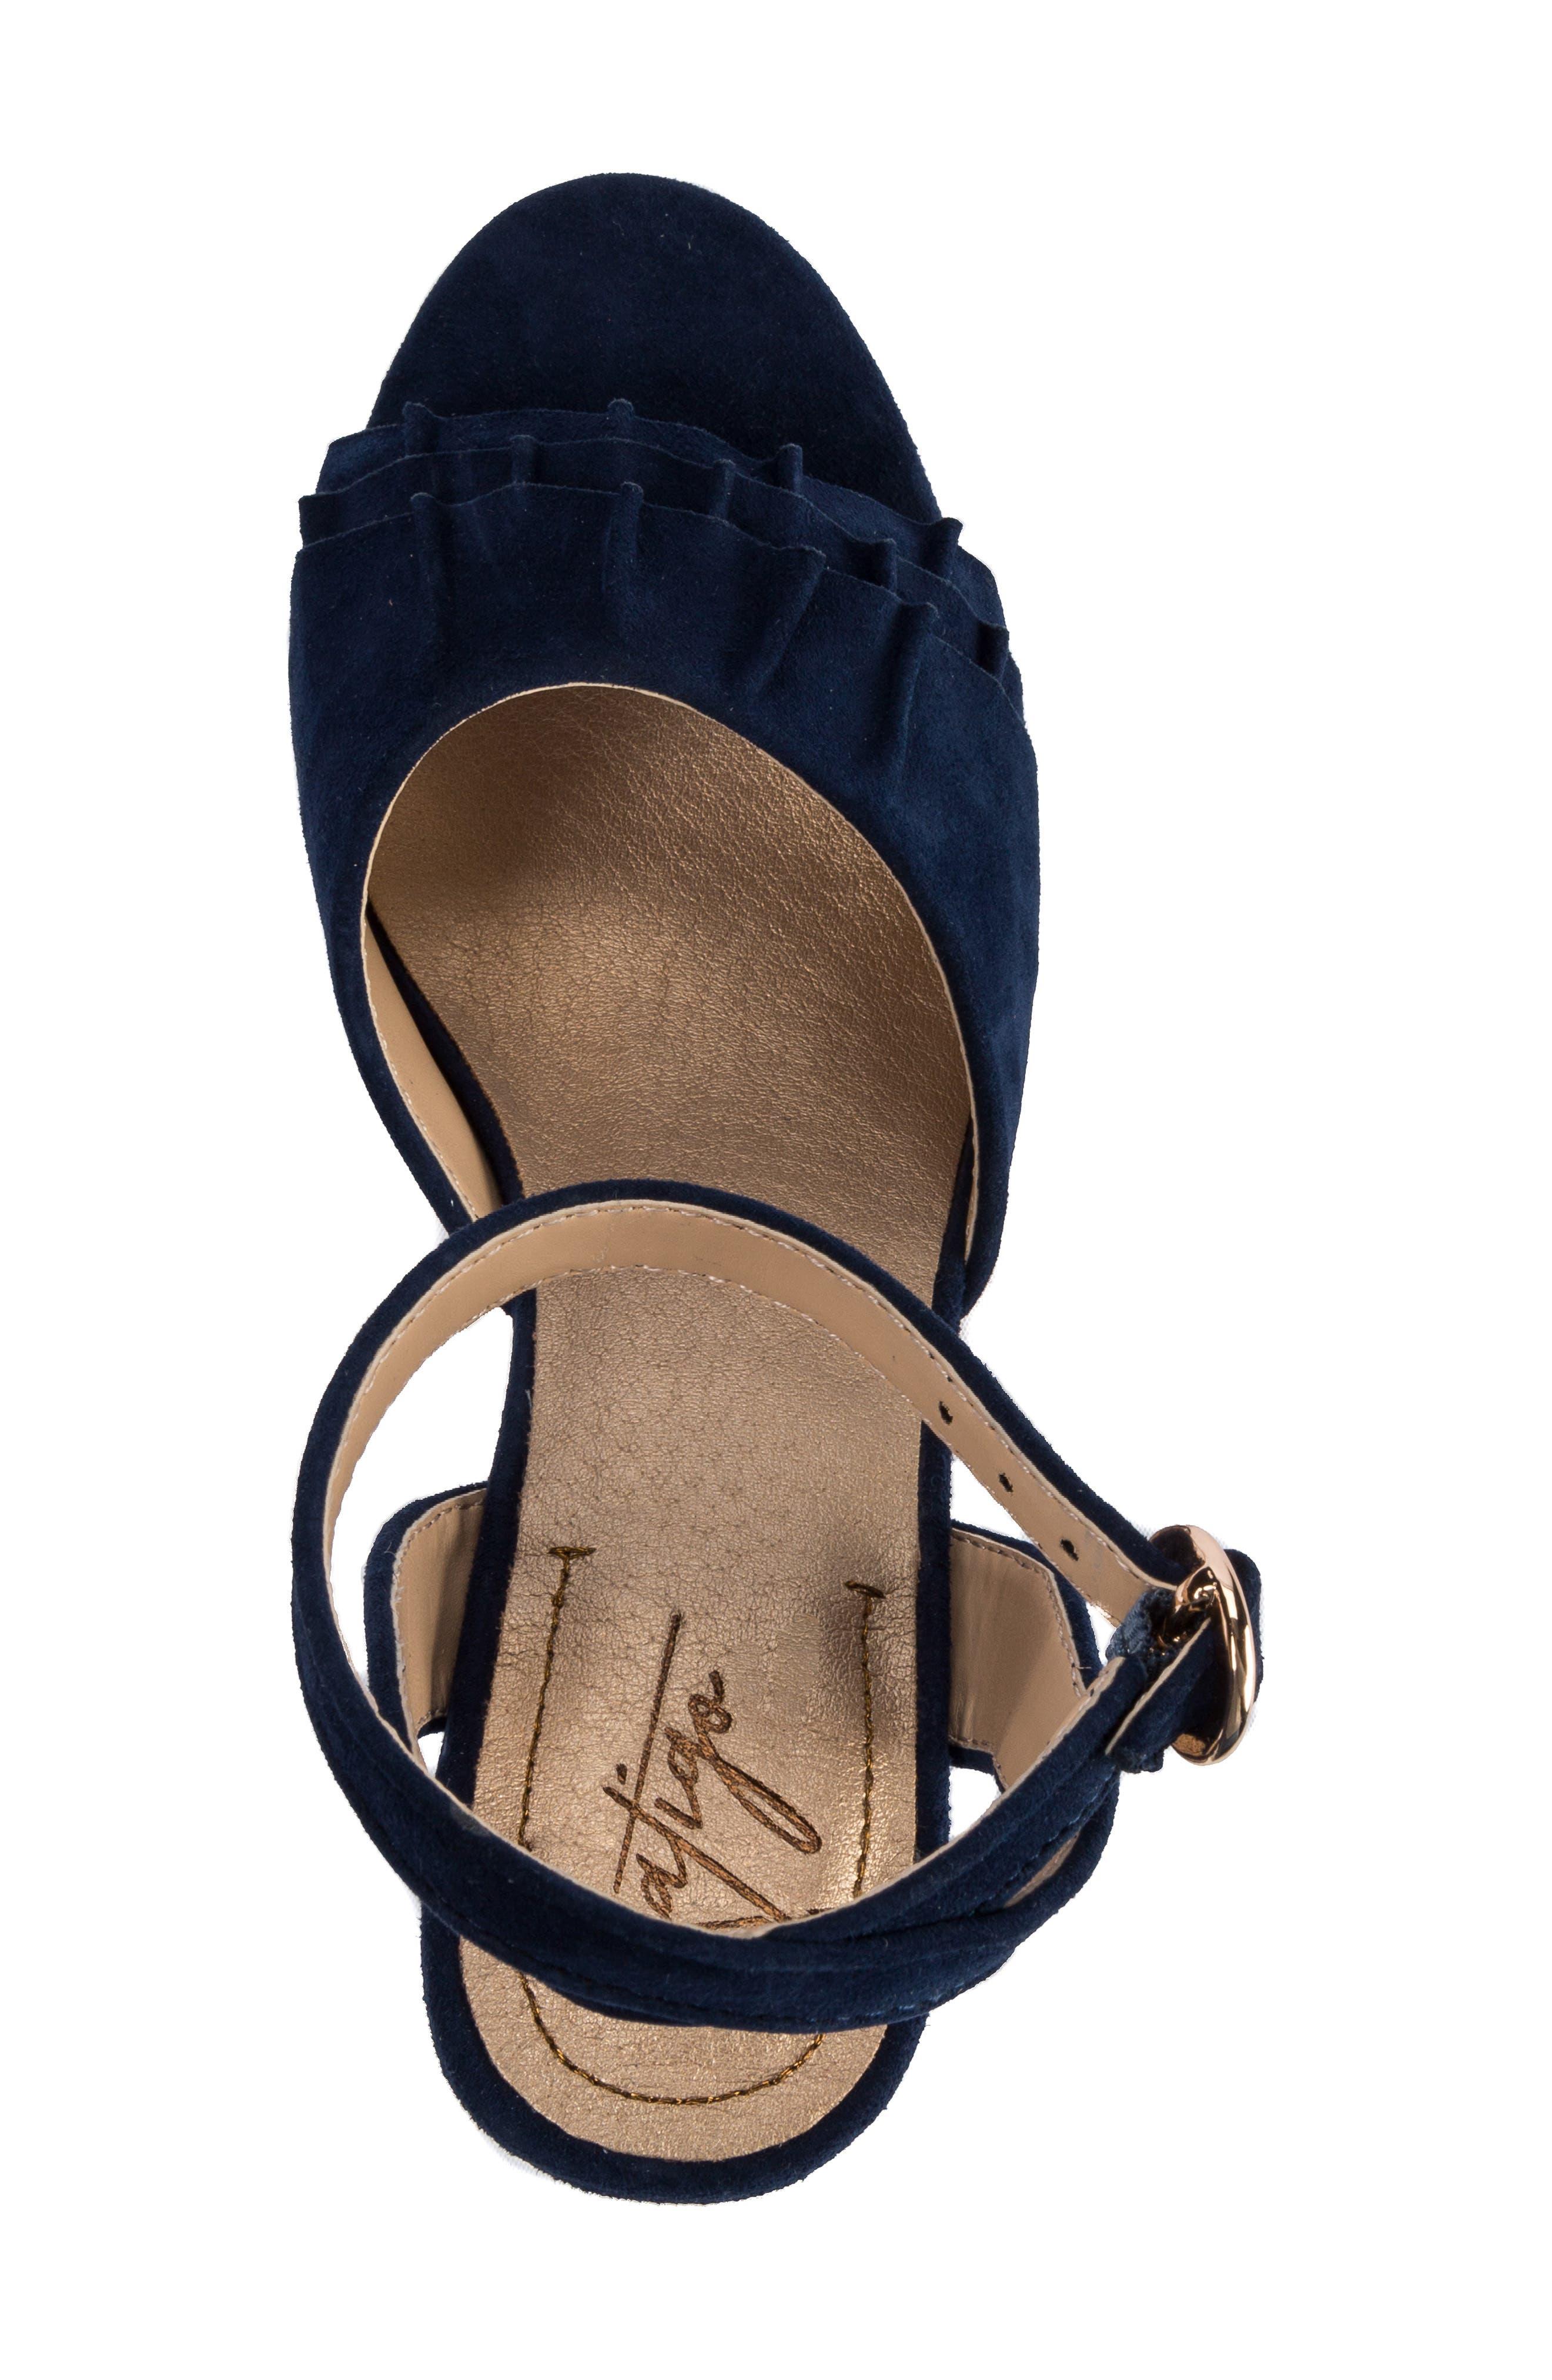 LATIGO, Idelle Ankle Strap Sandal, Alternate thumbnail 5, color, 410